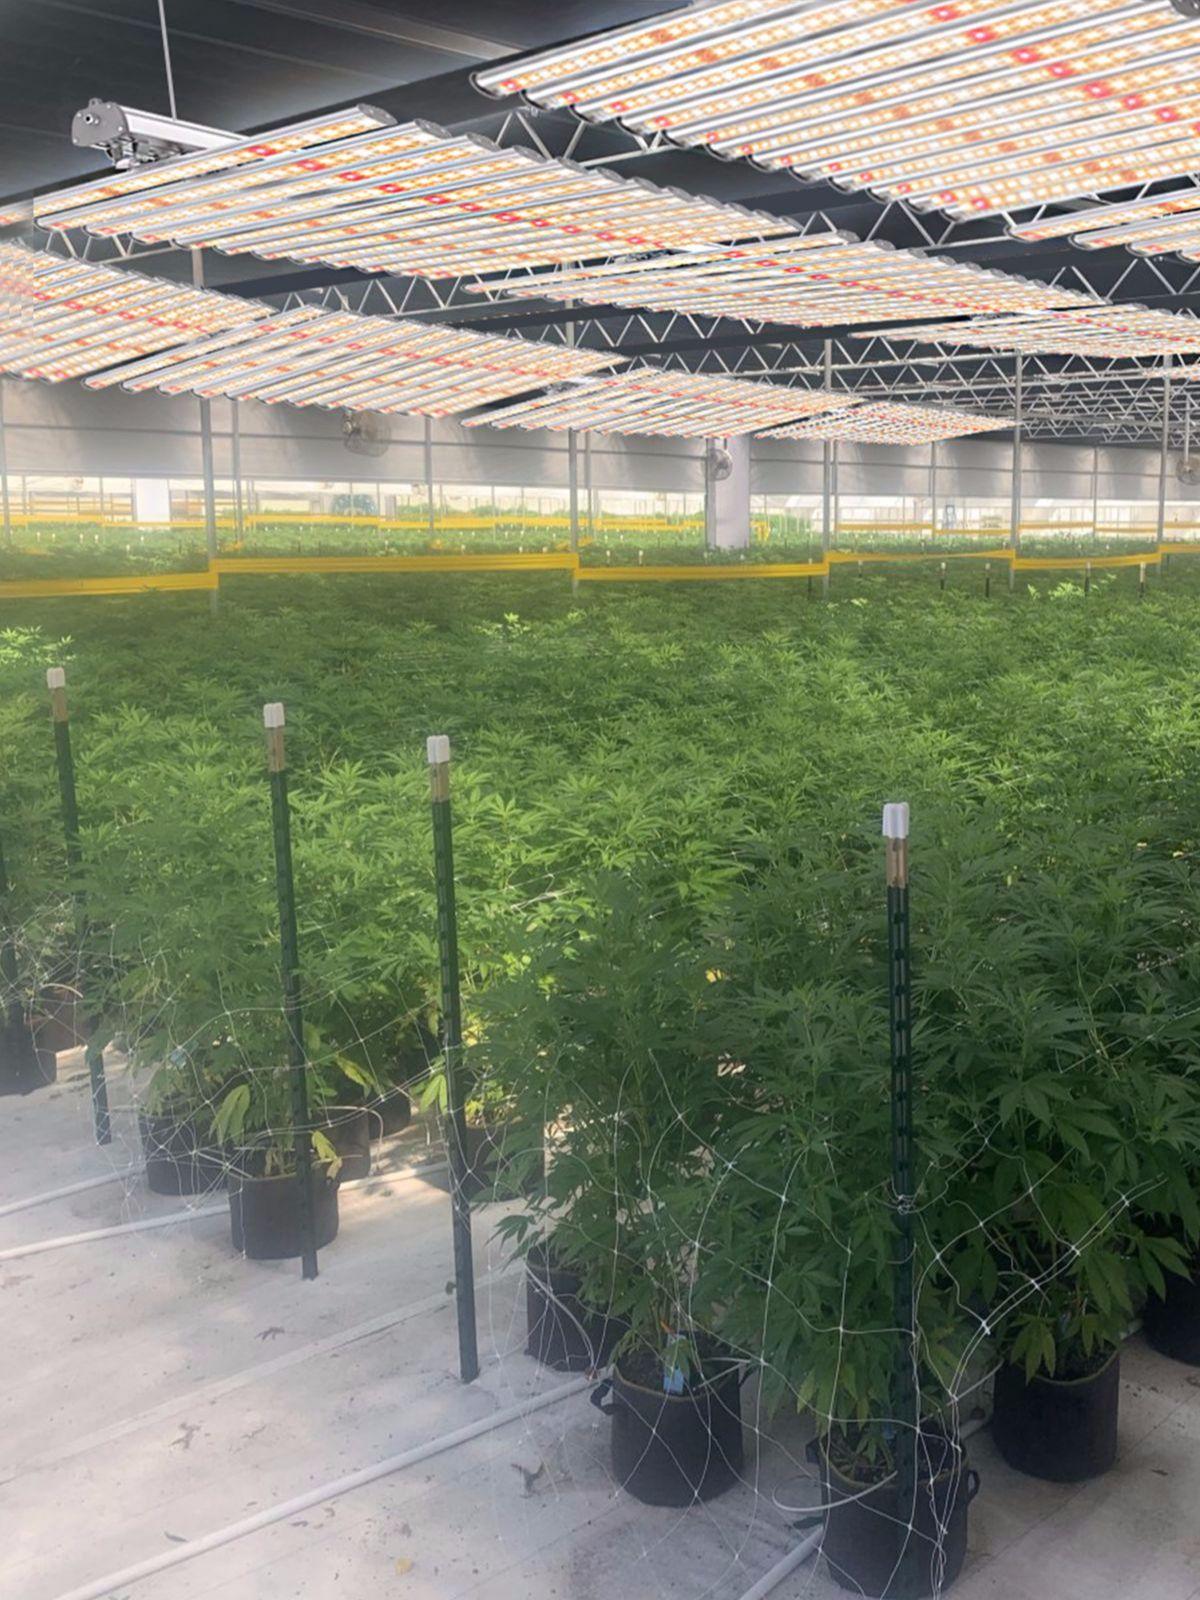 Detachable led grow light for indoor plant bars 720w equipment replacing 1000w hps for vertical farming phytolamp full spectrum enlarge